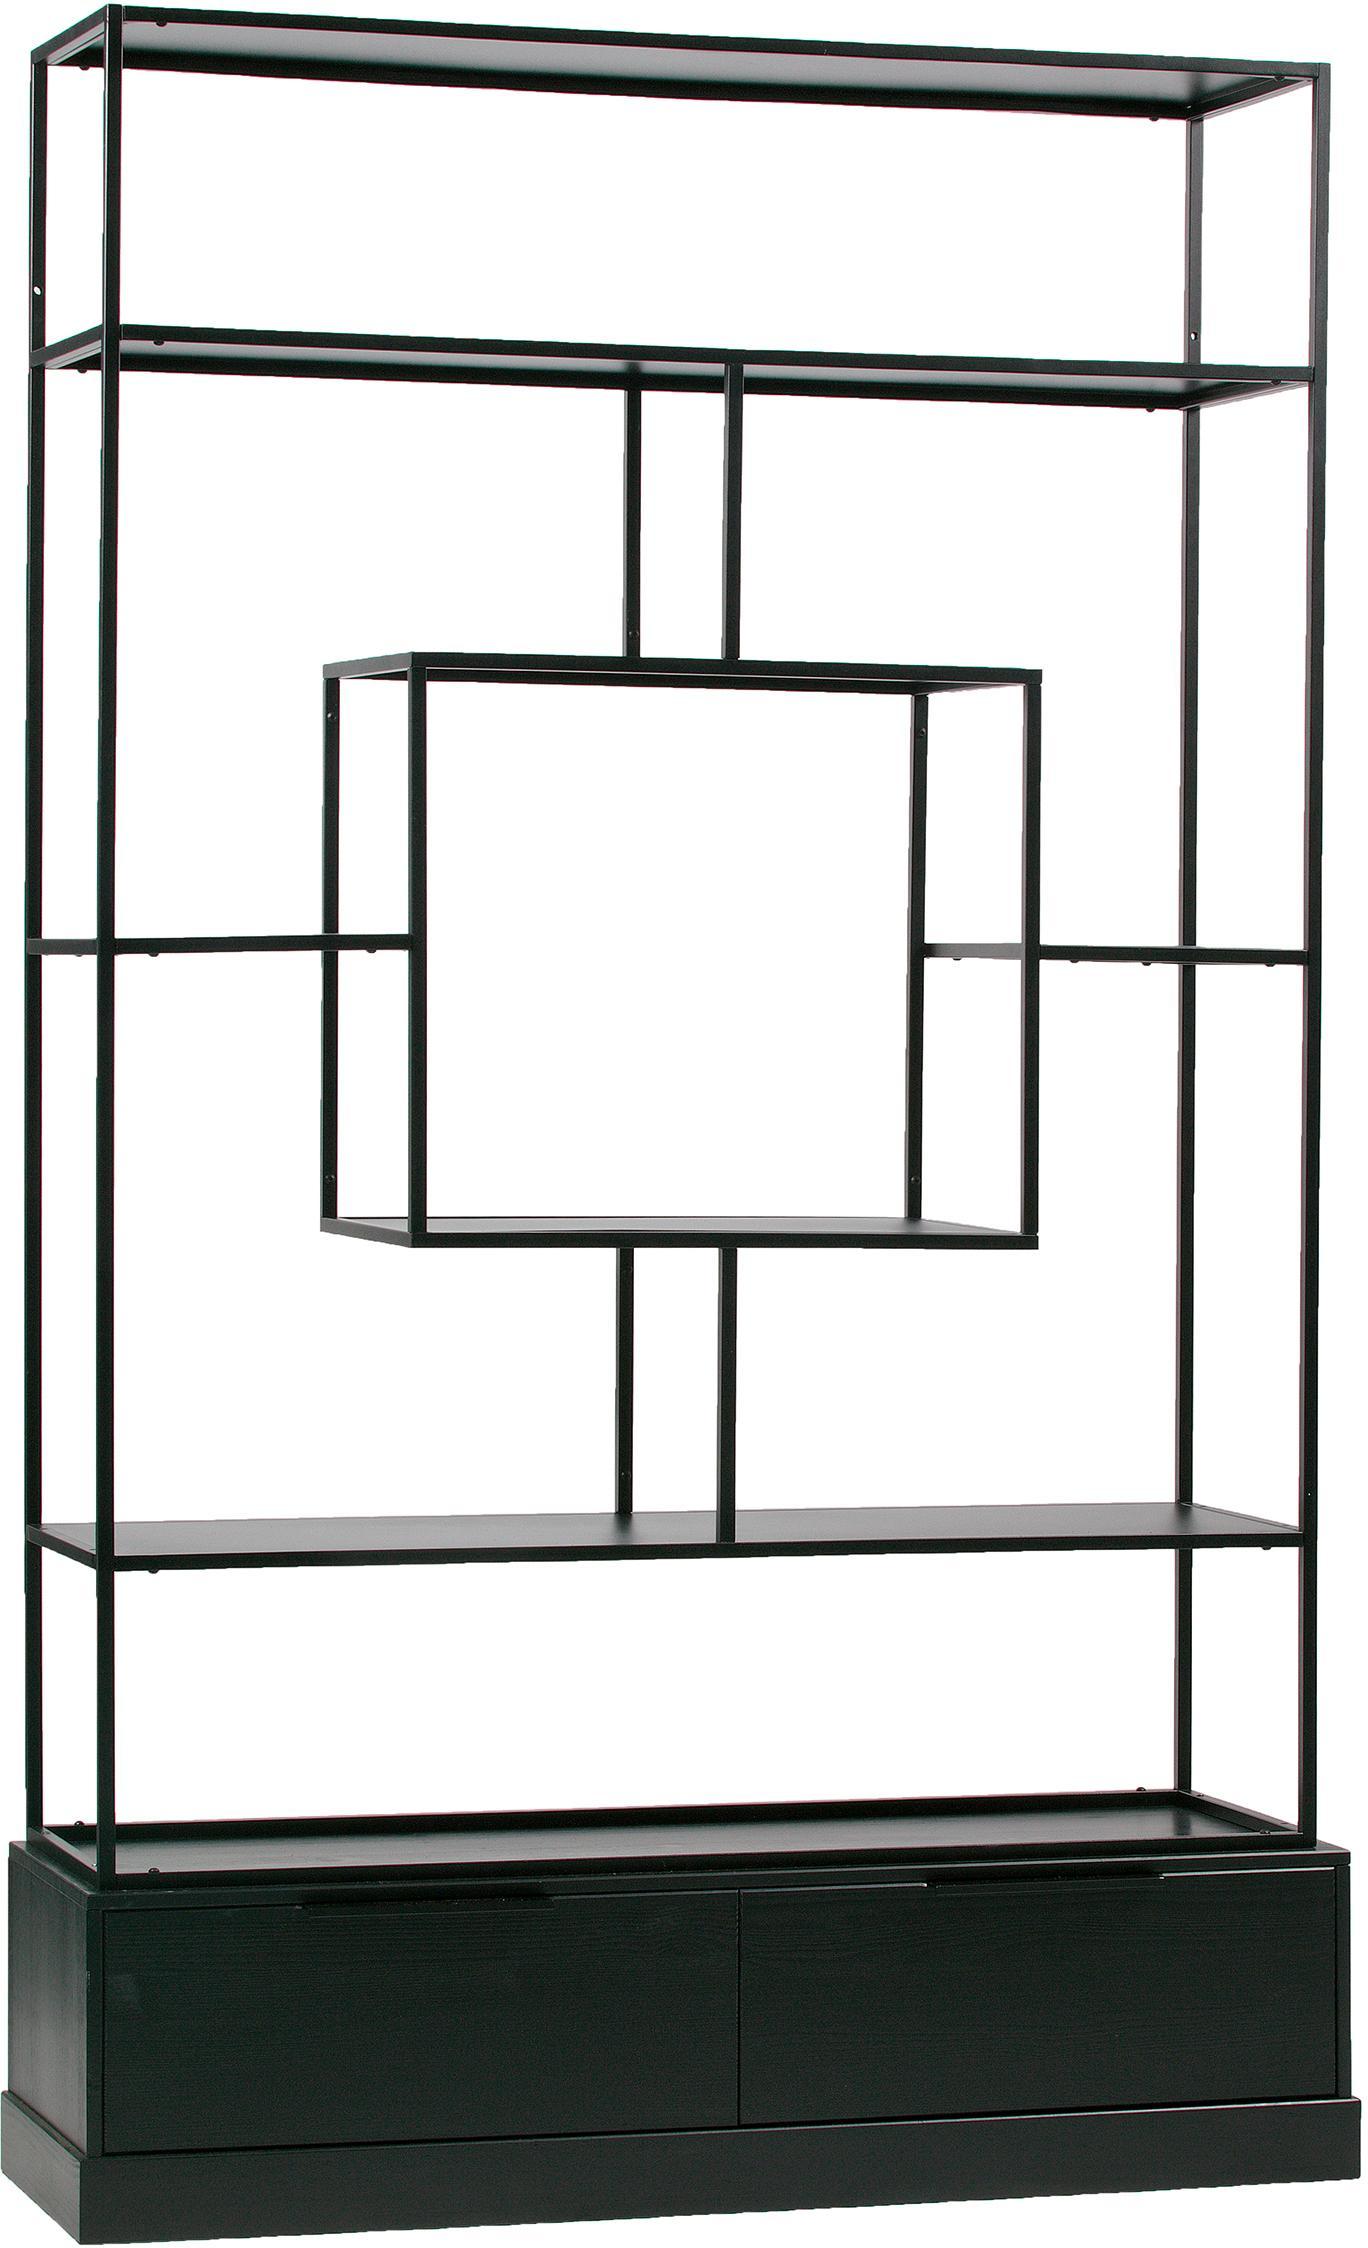 Libreria Fons, Cornice: metallo verniciato, Nero, Larg. 126 x Alt. 204 cm